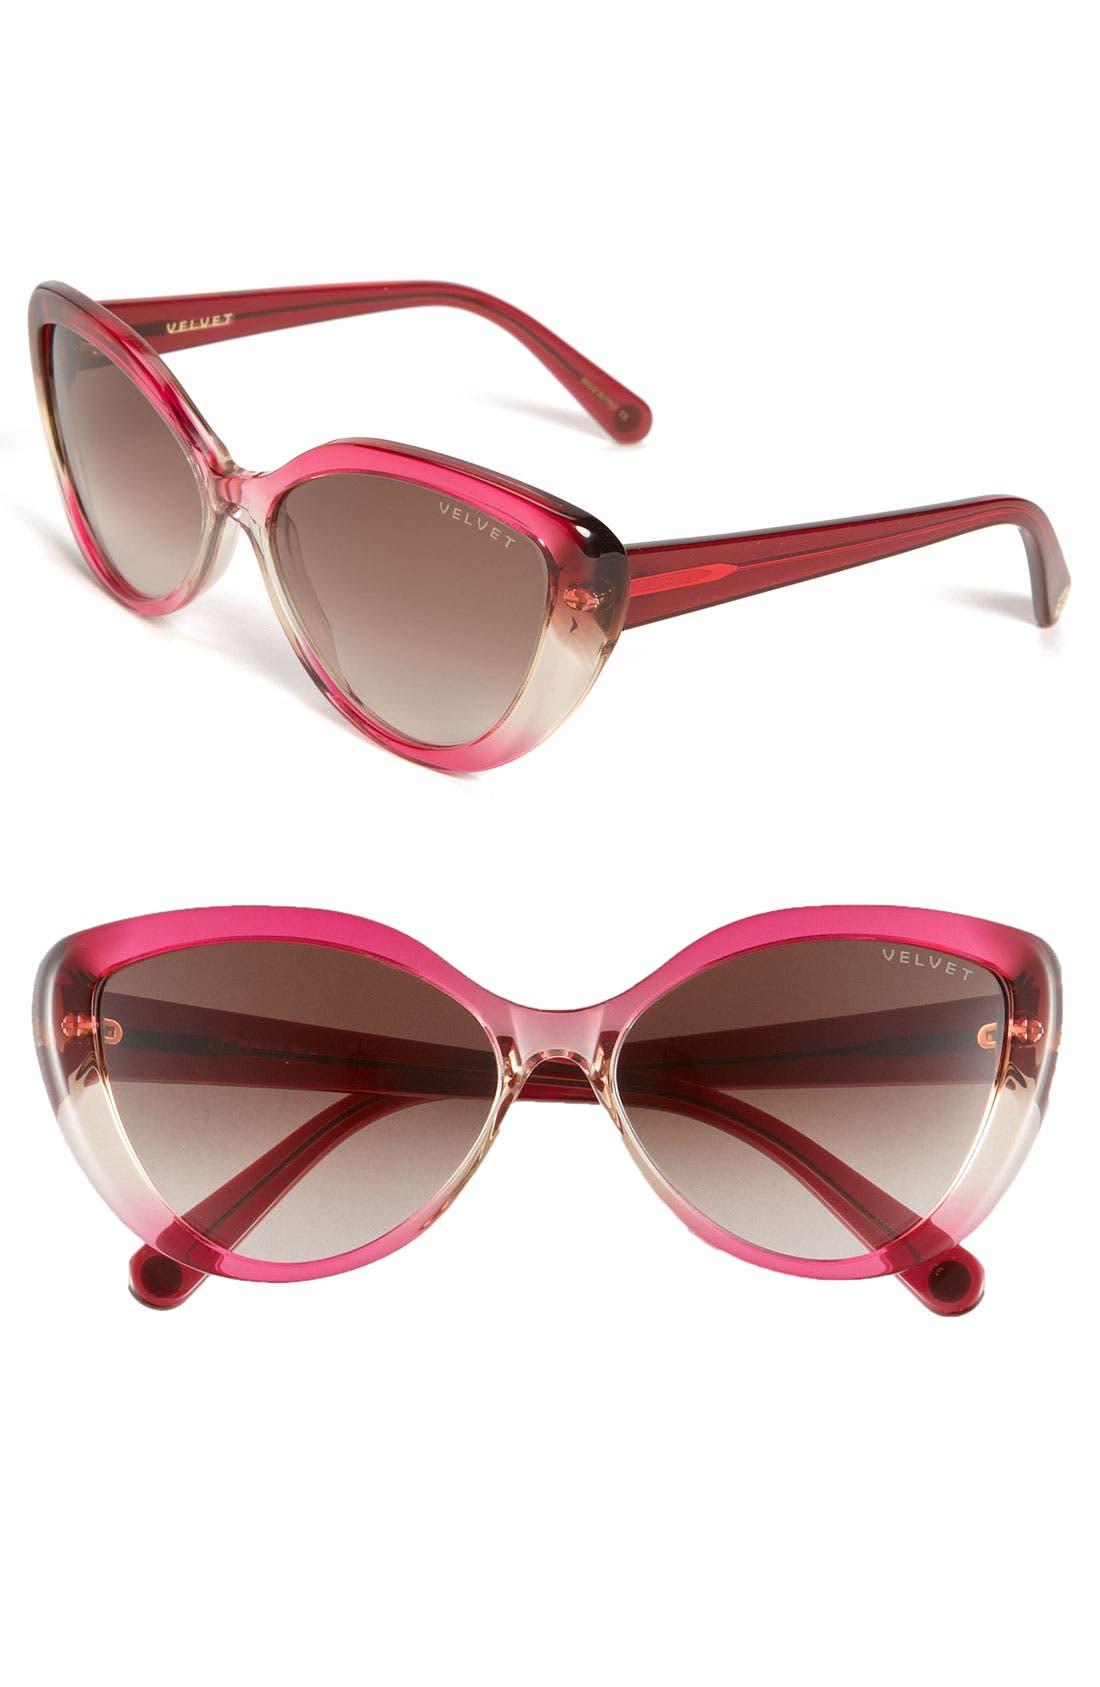 Main Image - Velvet Eyewear 'Joie' Sunglasses